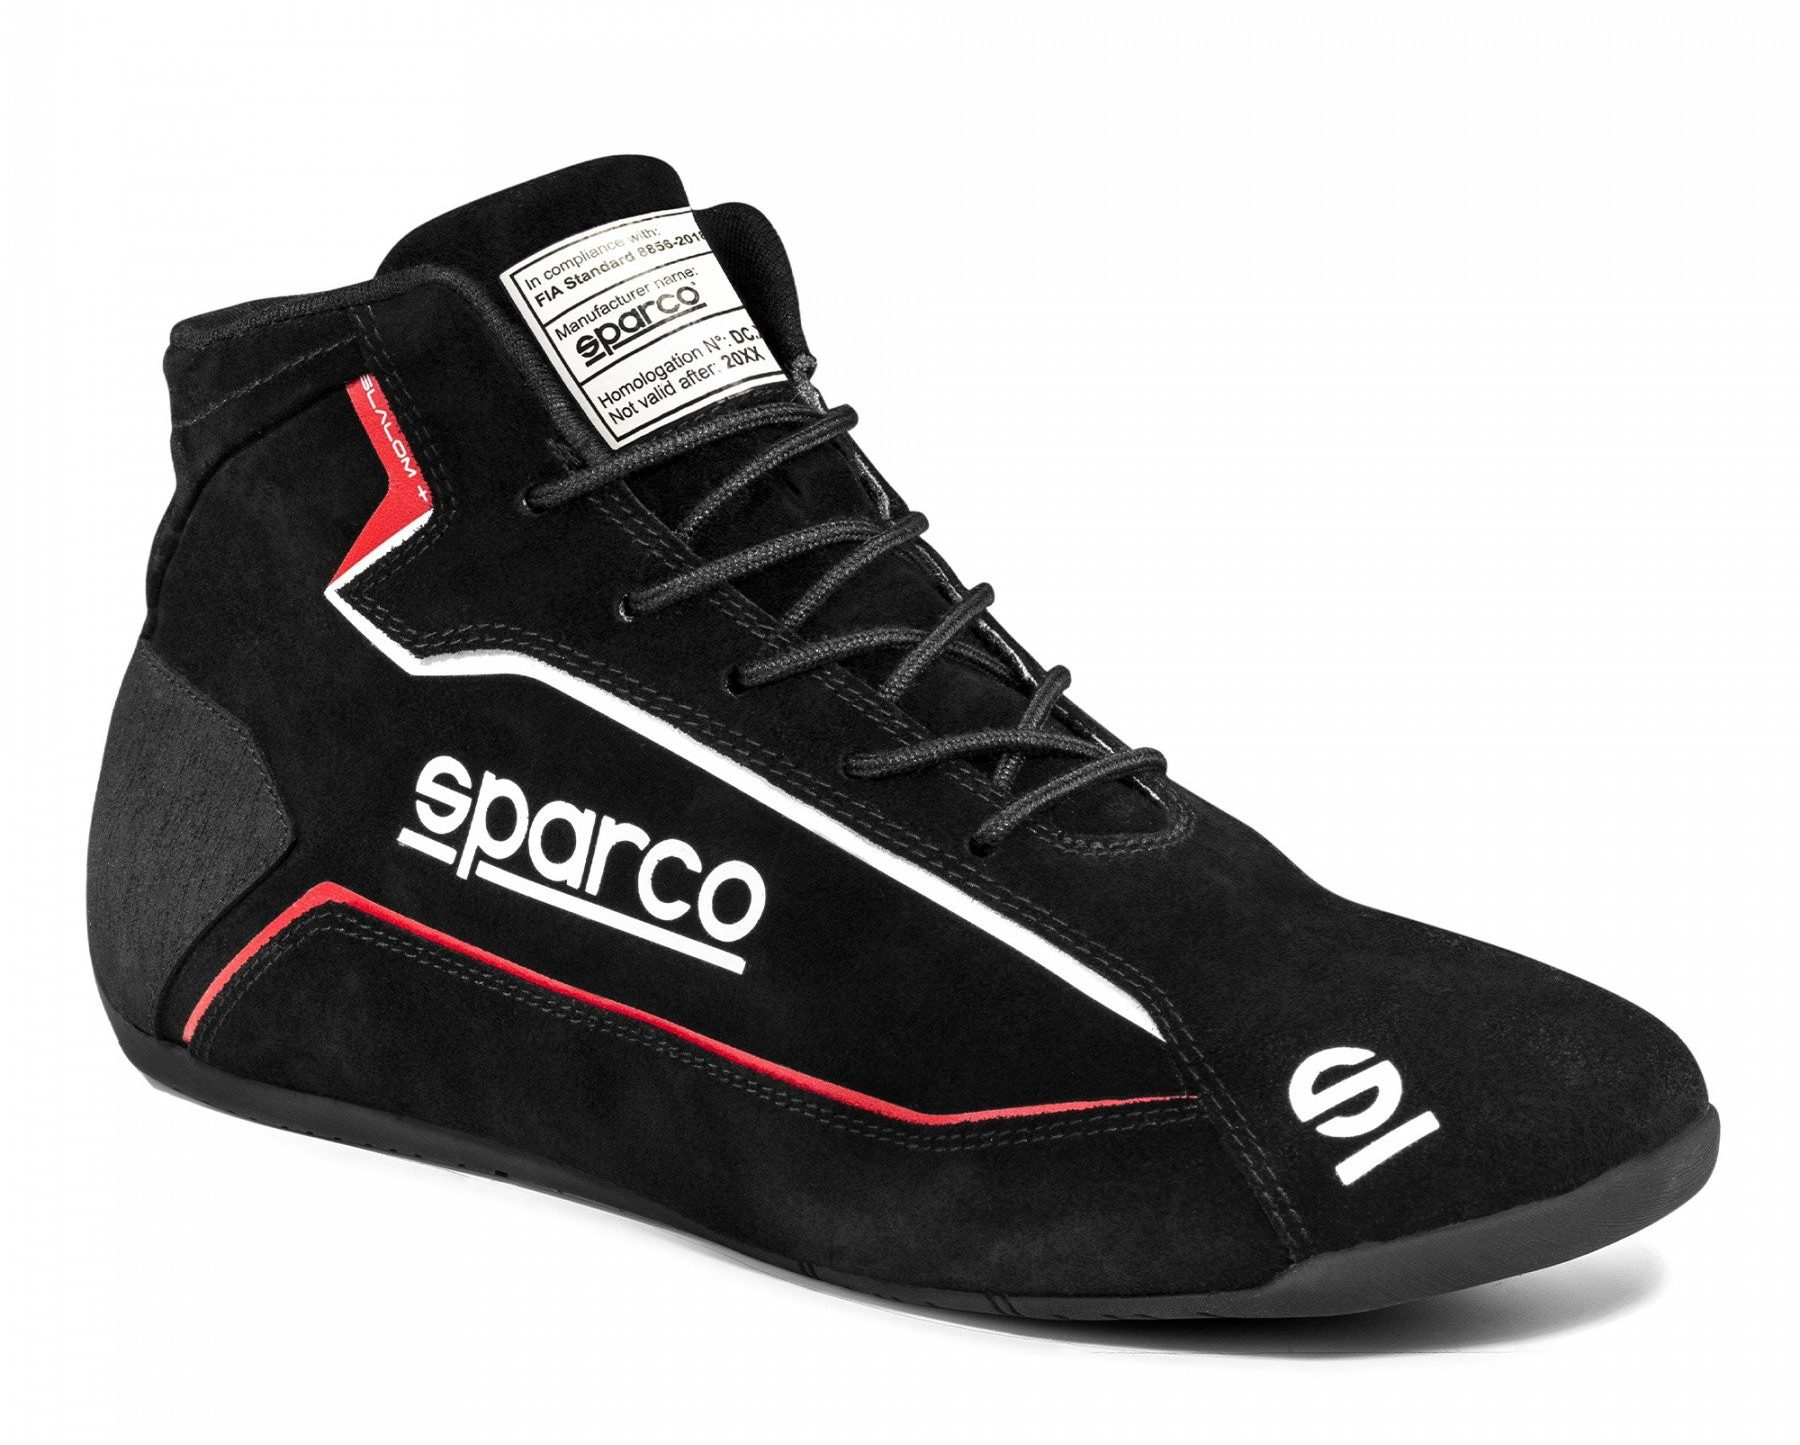 Нов продукт: Sparco Slalom+, FIA Shoes